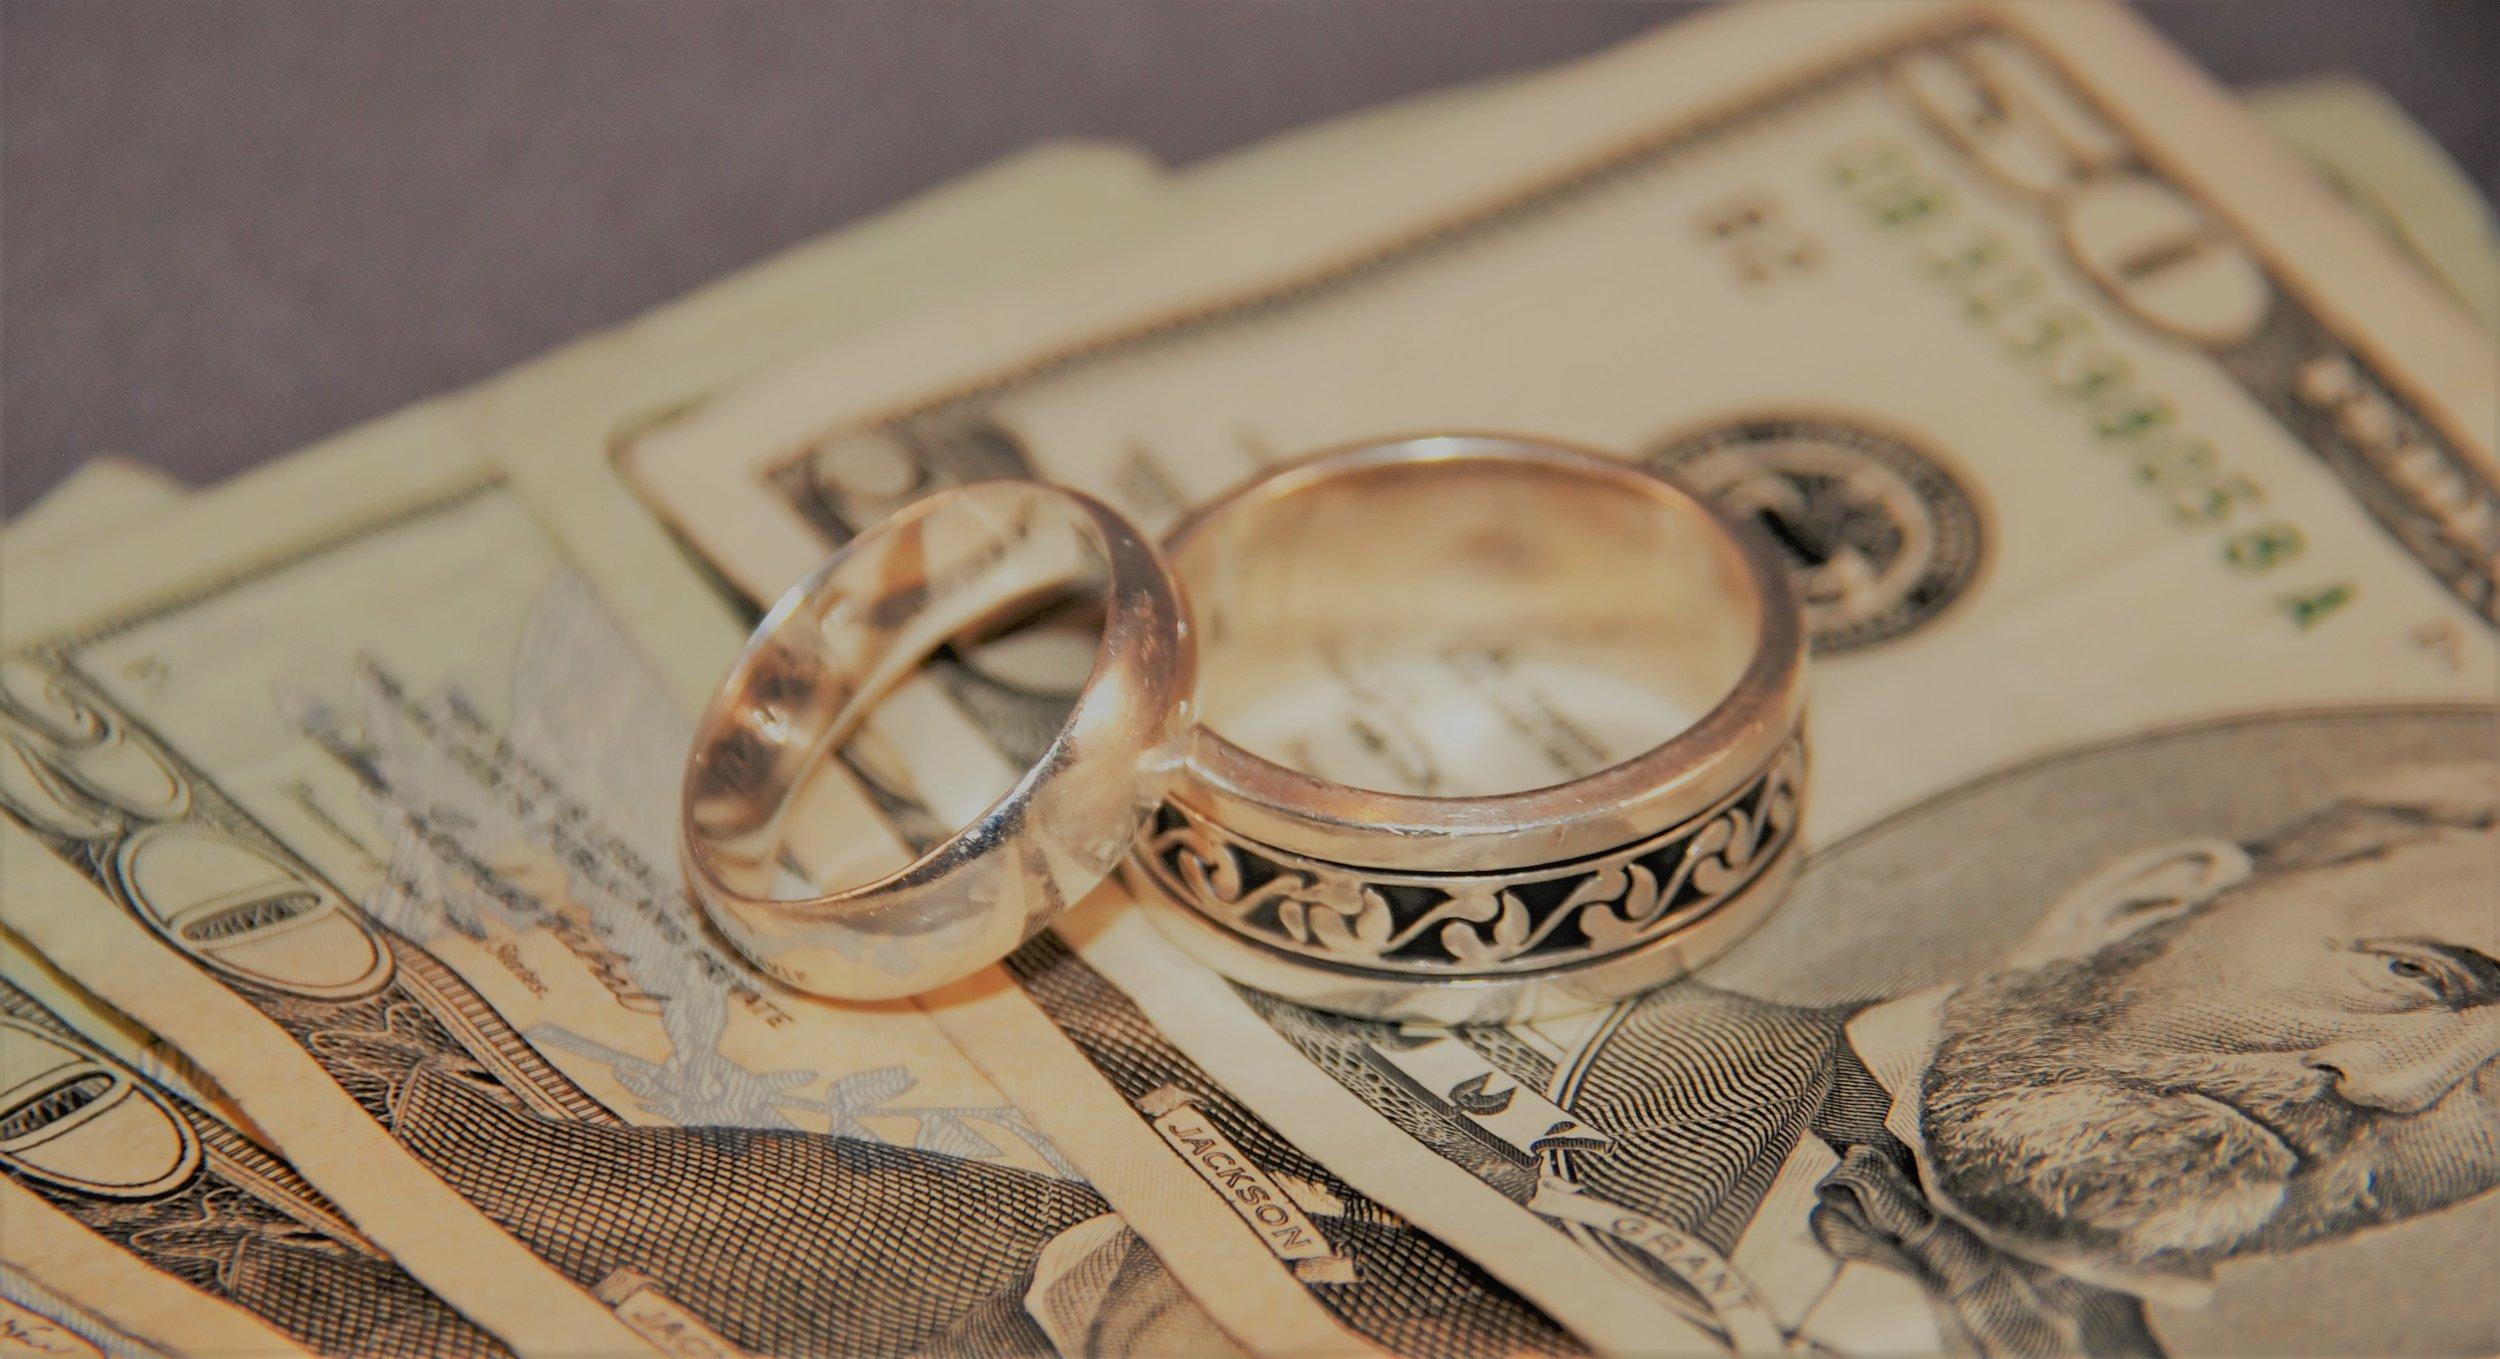 rings and money.jpg